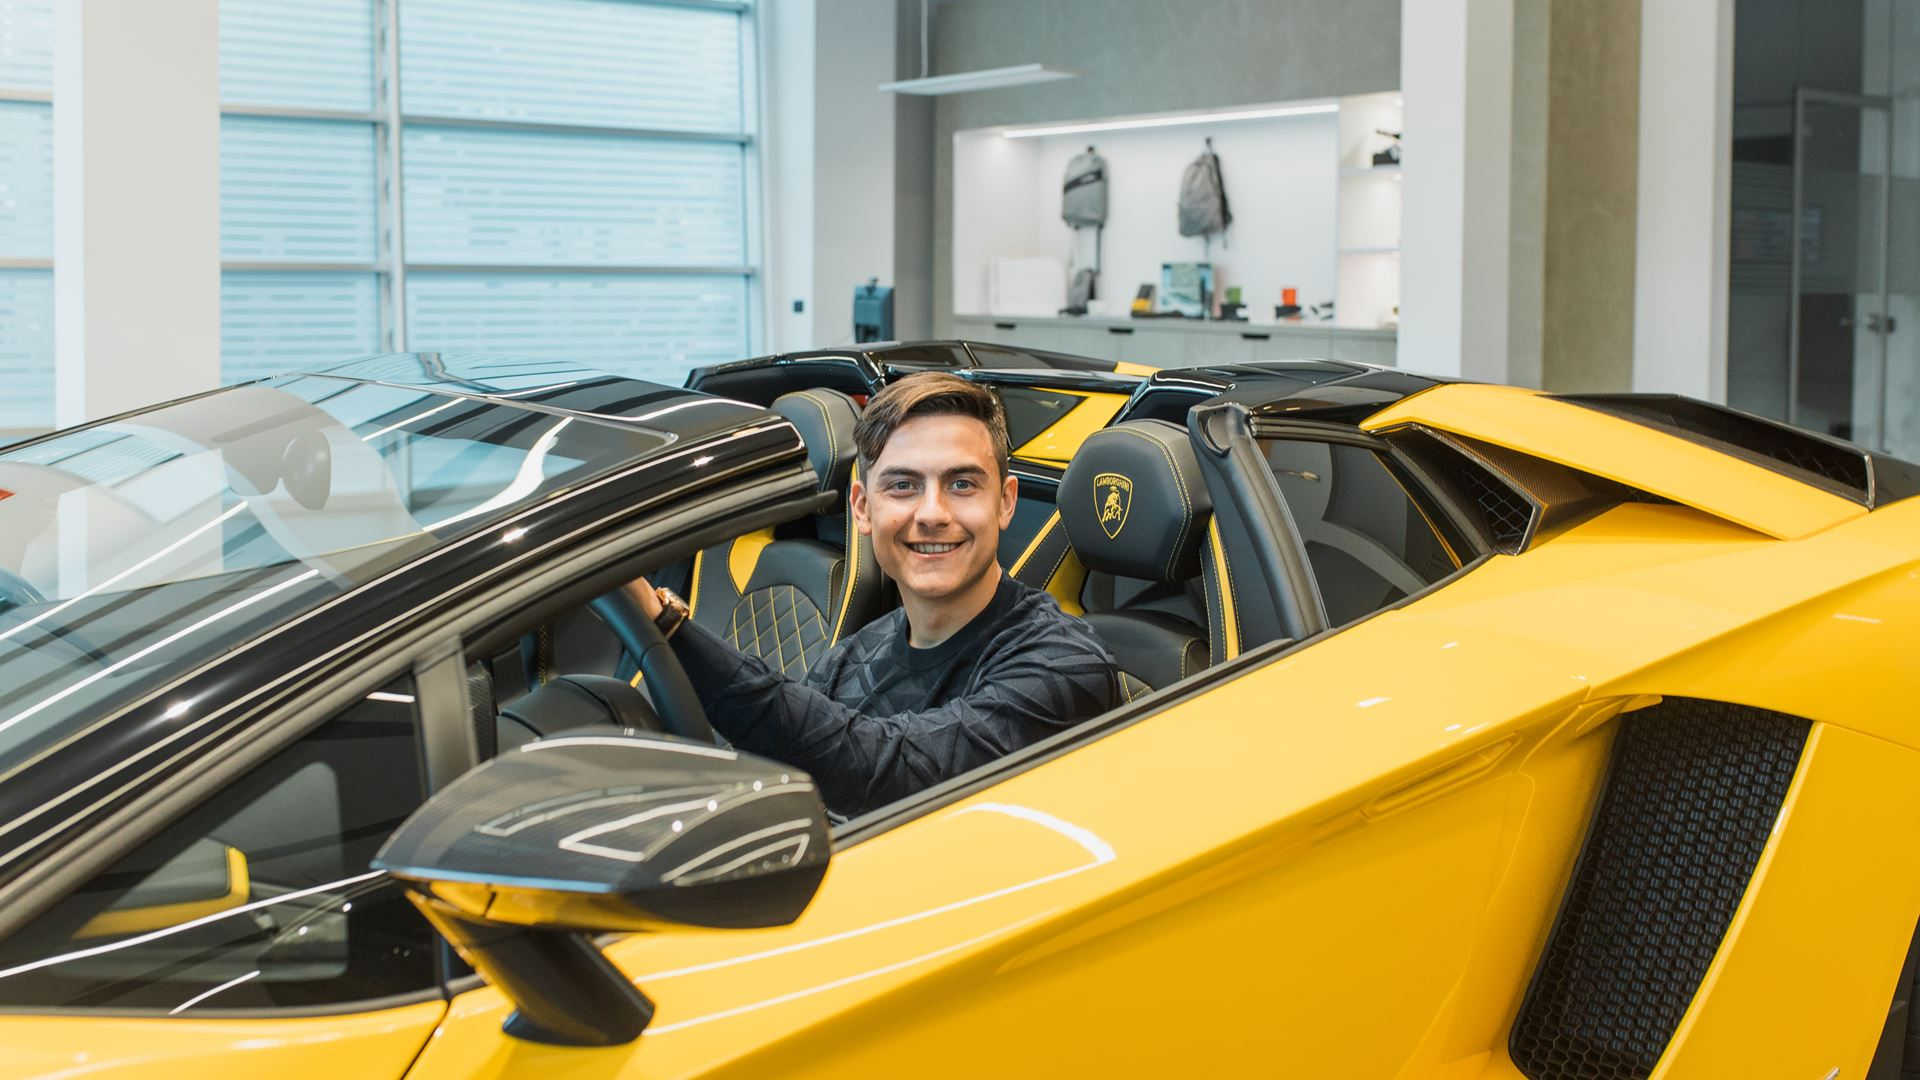 Football Star Paulo Dybala Celebrates 100th Goal with a New Lamborghini - Image 4